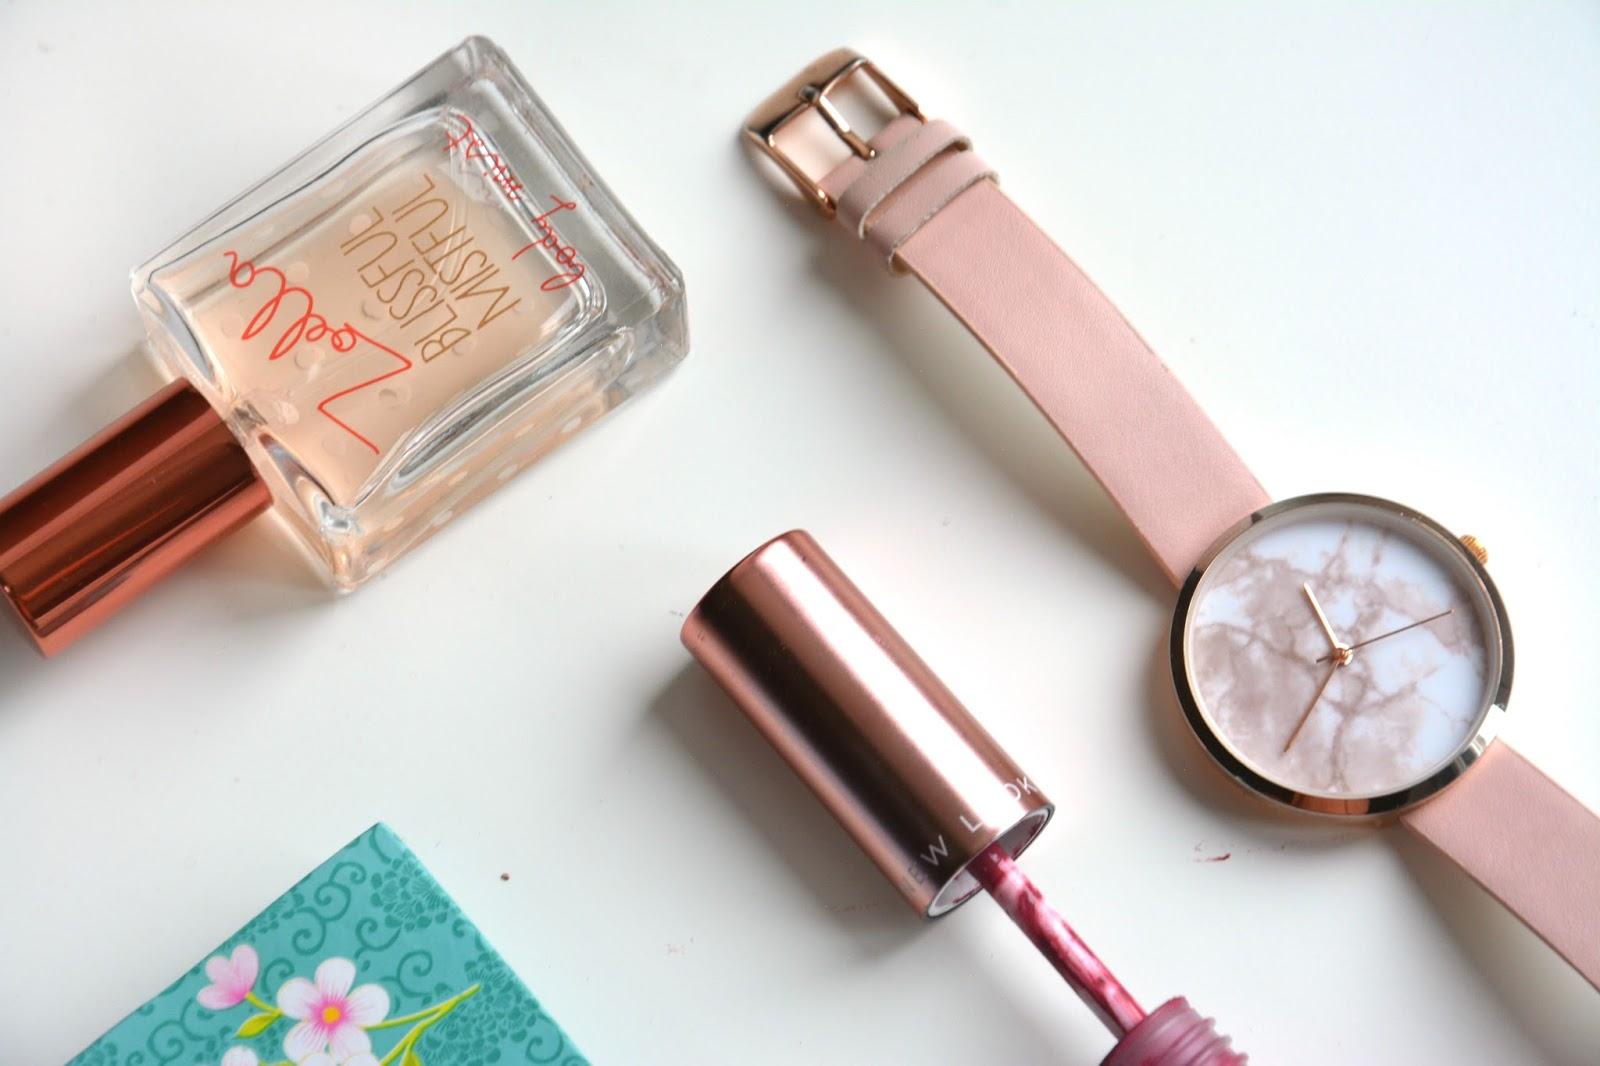 Zoella Blissful Mistful Body Mist; Asos Watch; New Look Super Matte Liquid Lipstick